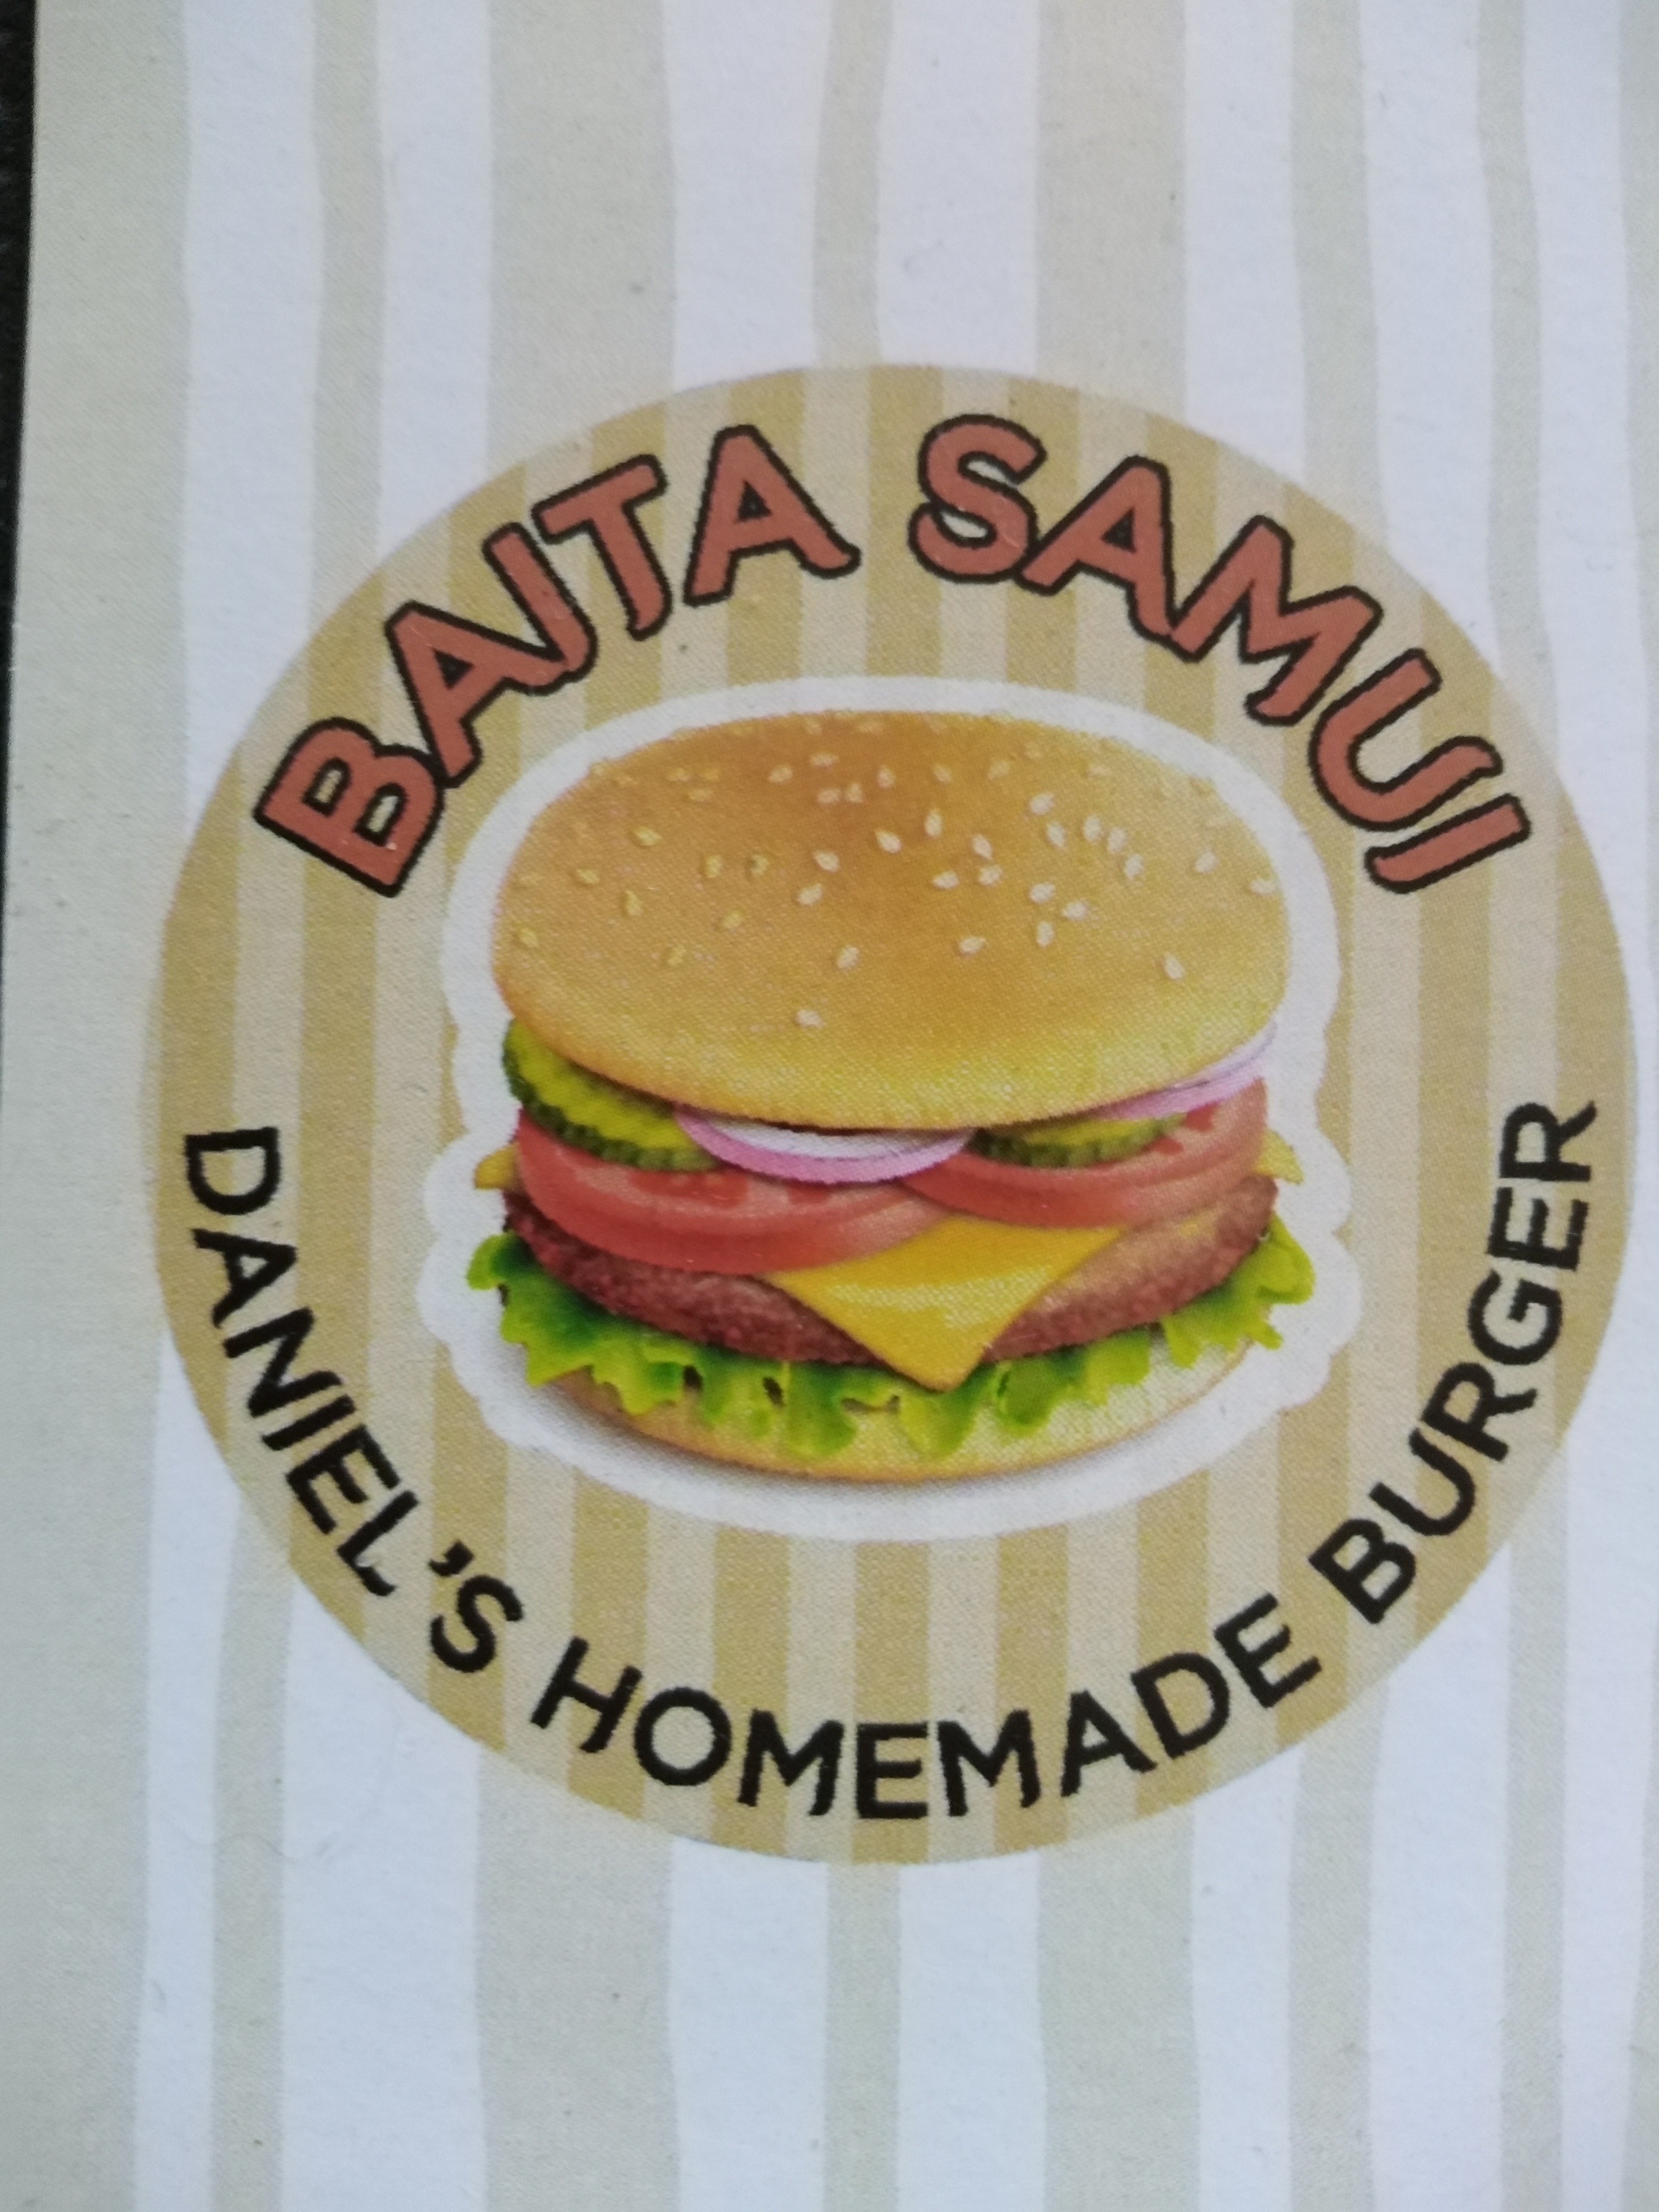 Baita-Samui Daniel's homemade burger